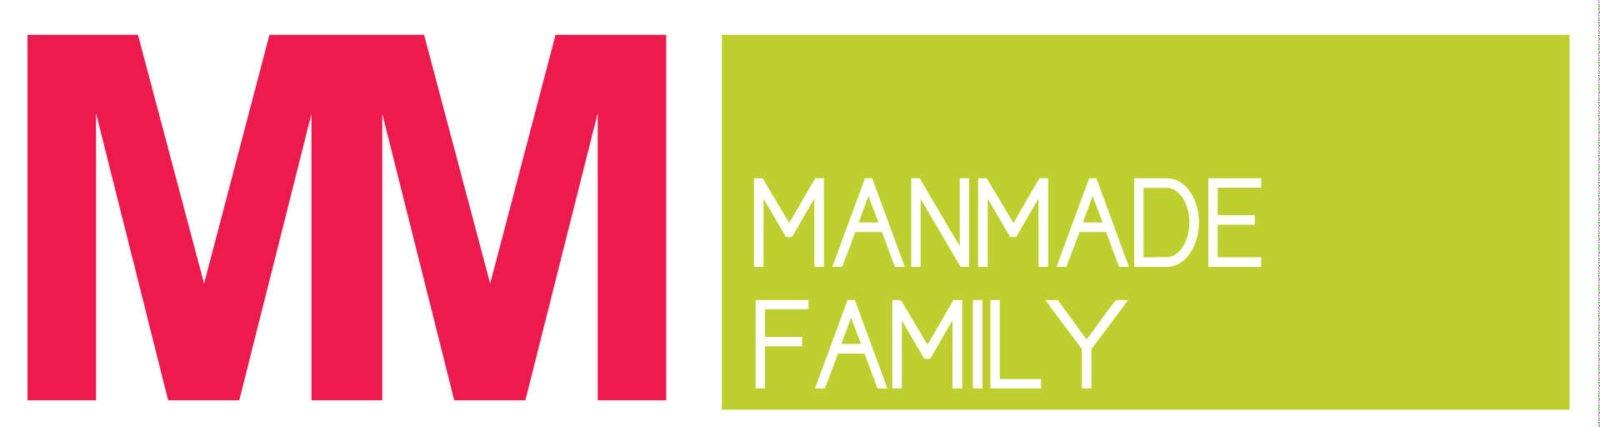 Man-Made-Family-